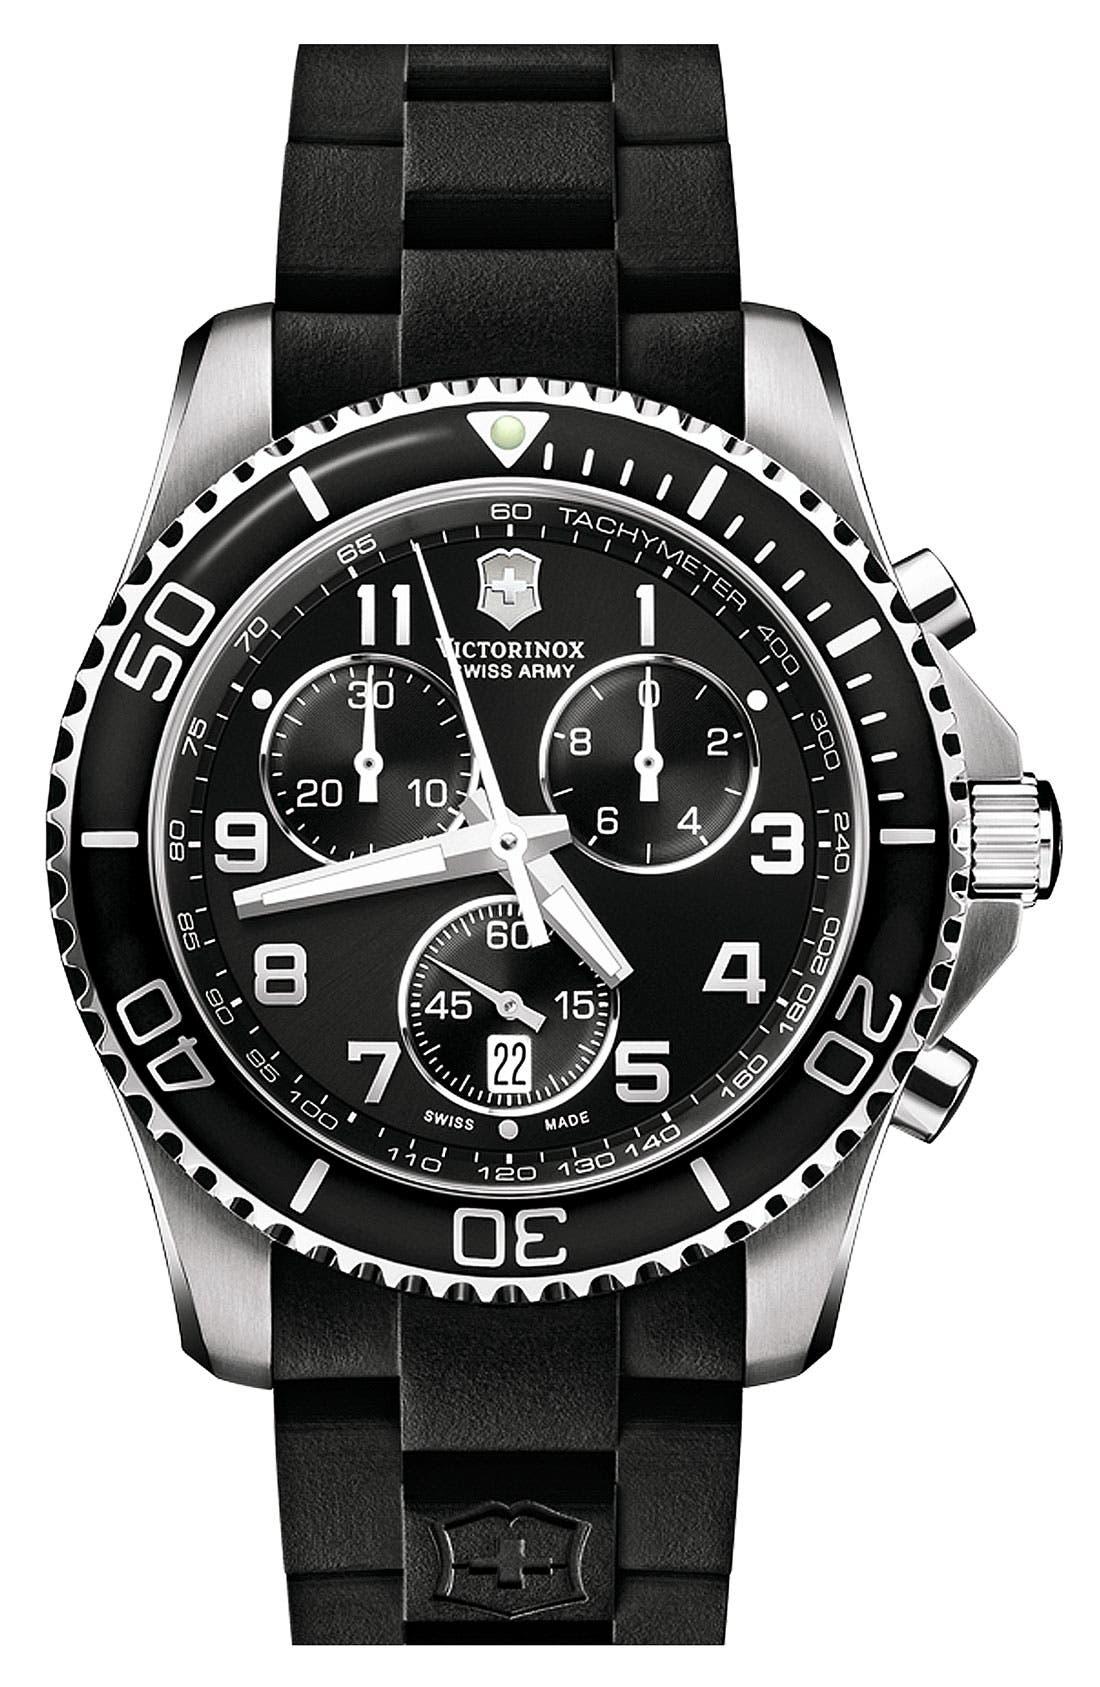 Main Image - Victorinox Swiss Army® 'Maverick GS' Rubber Strap Chronograph Watch, 43mm